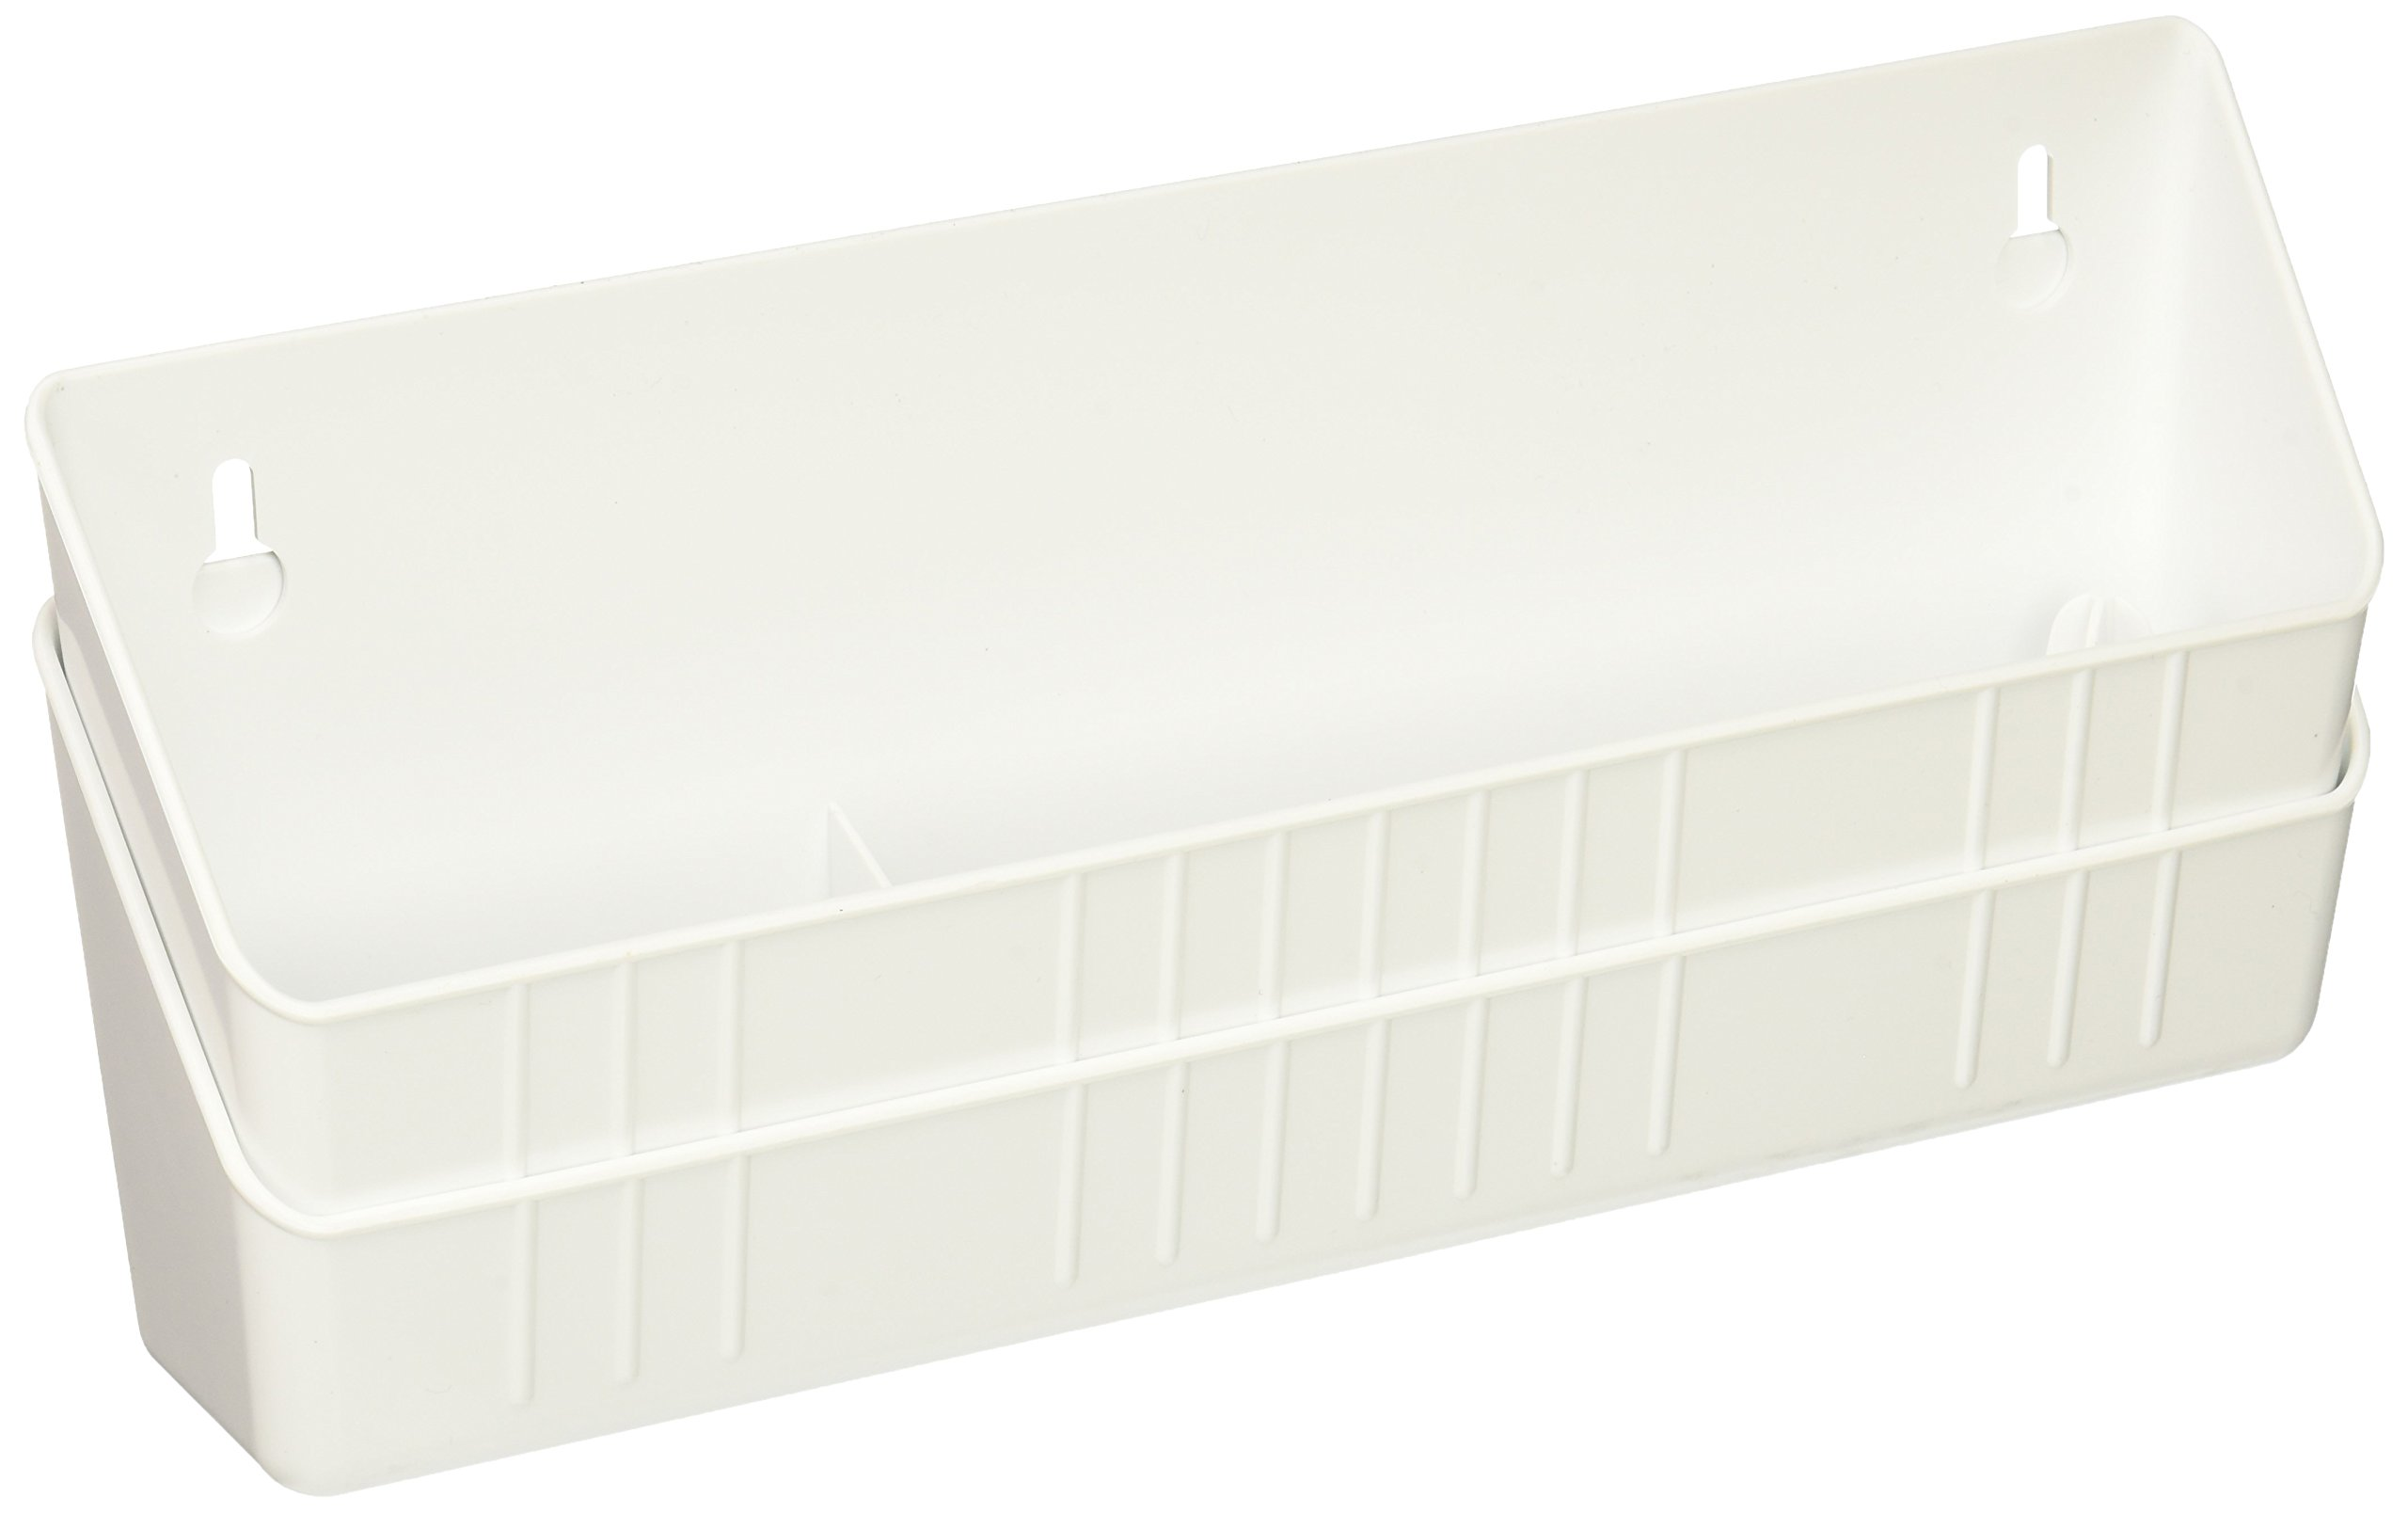 Rev-A-Shelf 11 Tip-Out Front Sink Tray Set